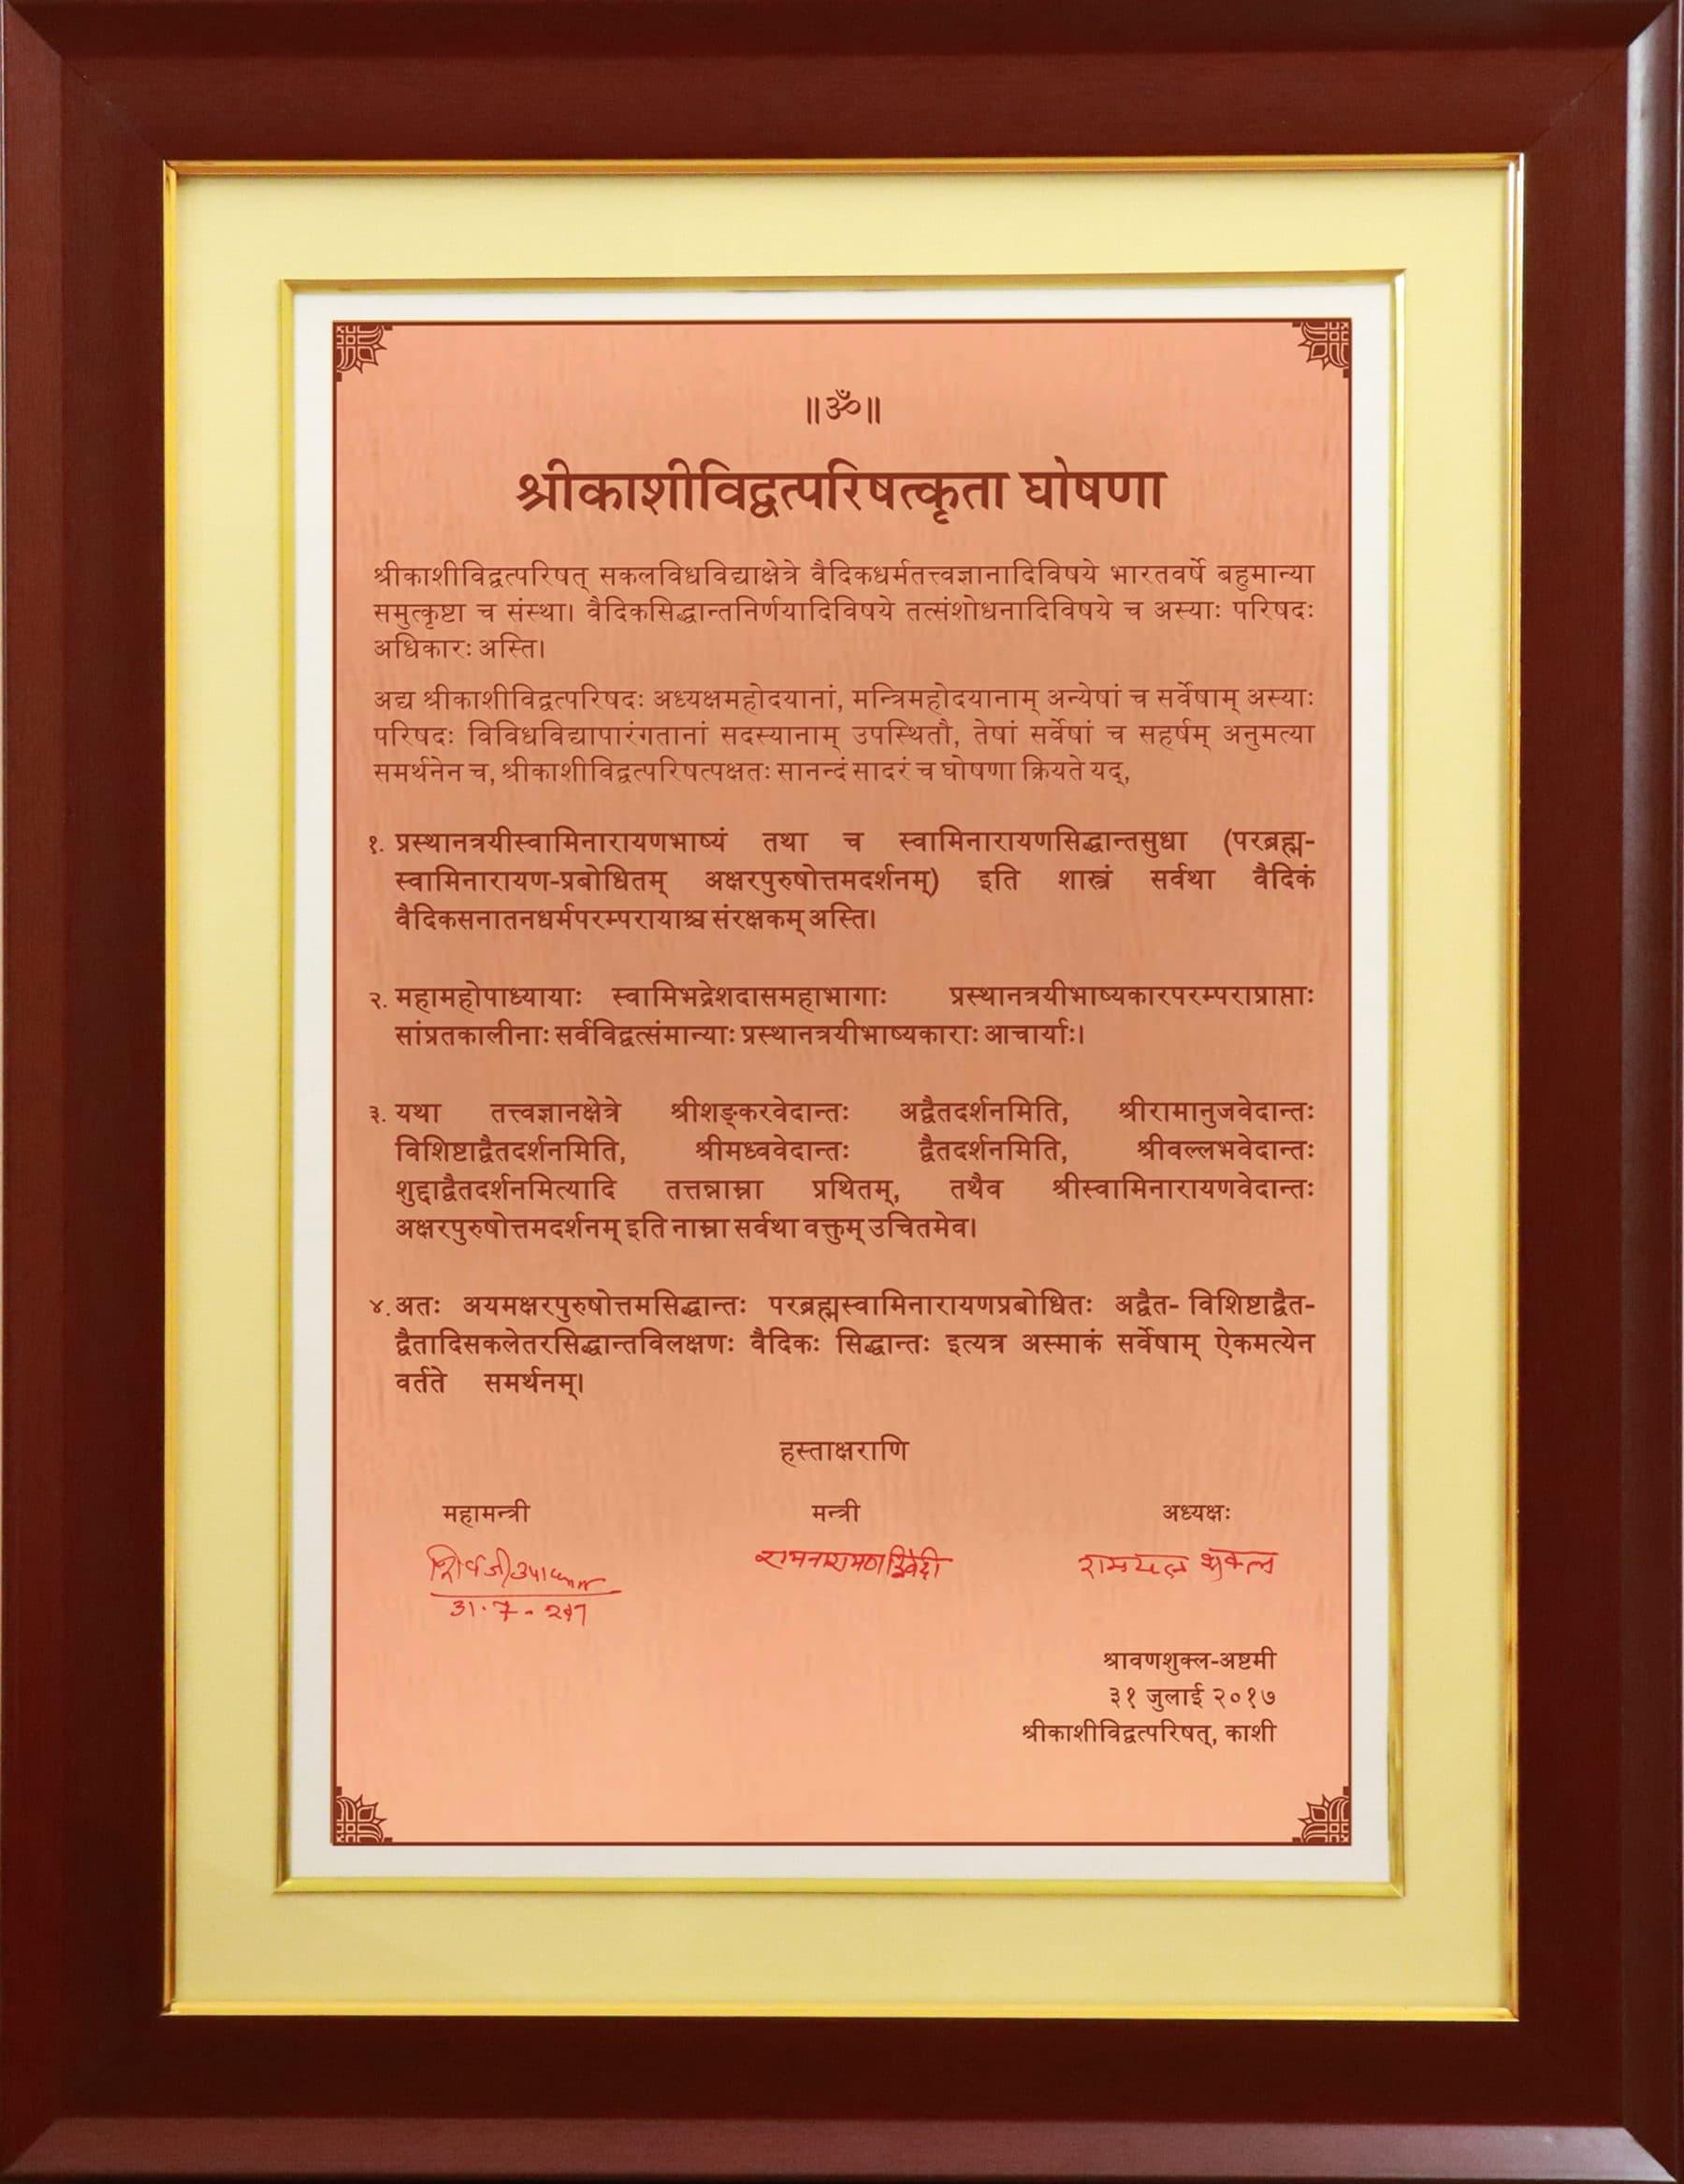 Śrī Kāśī Vidvat Pariṣad's admiration, commendation, and recognition of the Svāminārāyaṇasiddhāntasudhā by presenting the Pariṣad's copper-plated letter of declaration